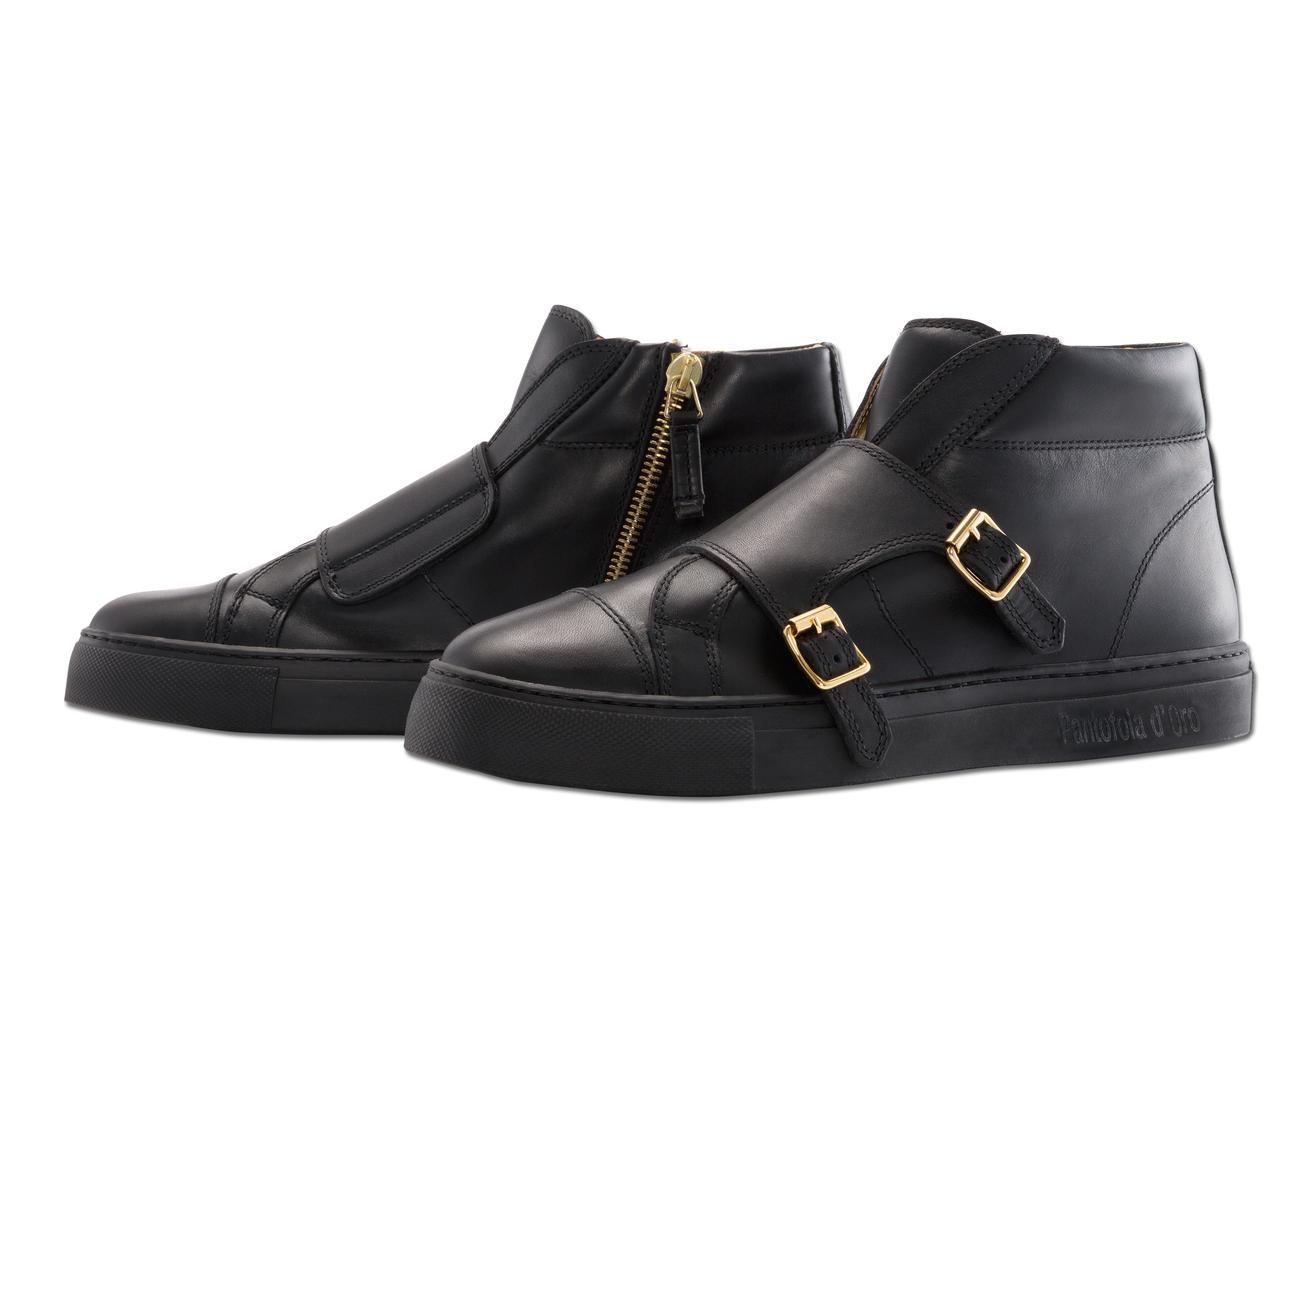 Pro Idee Schuhe : pantofola d oro sneaker 3 jahre garantie pro idee ~ Lizthompson.info Haus und Dekorationen